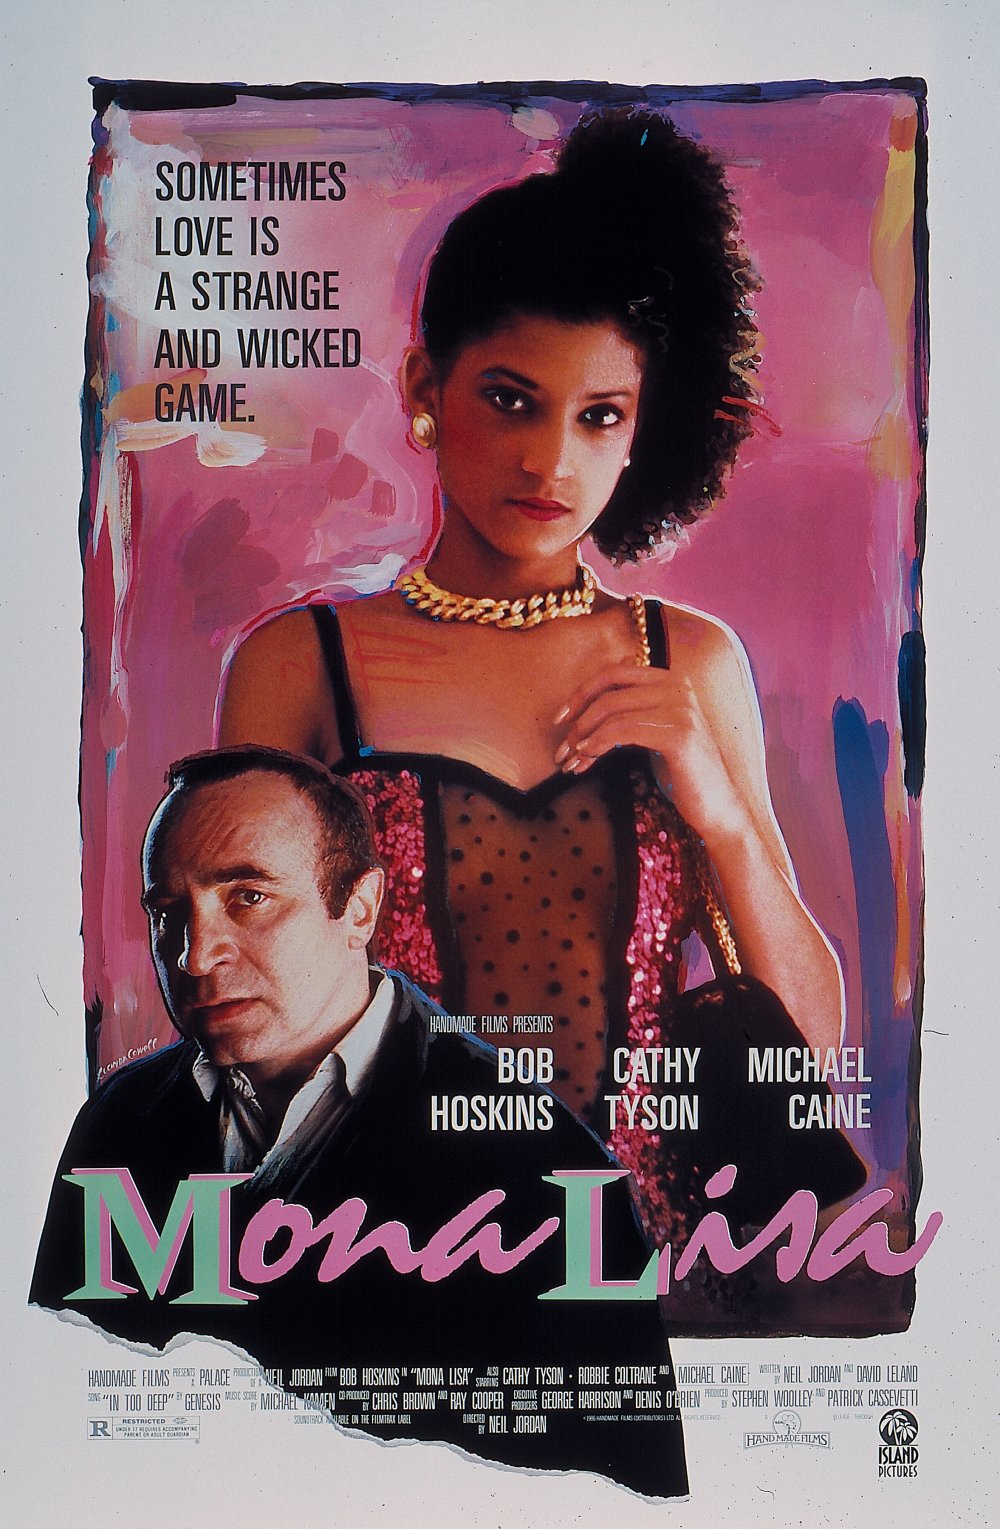 The original 1986 poster for Mona Lisa